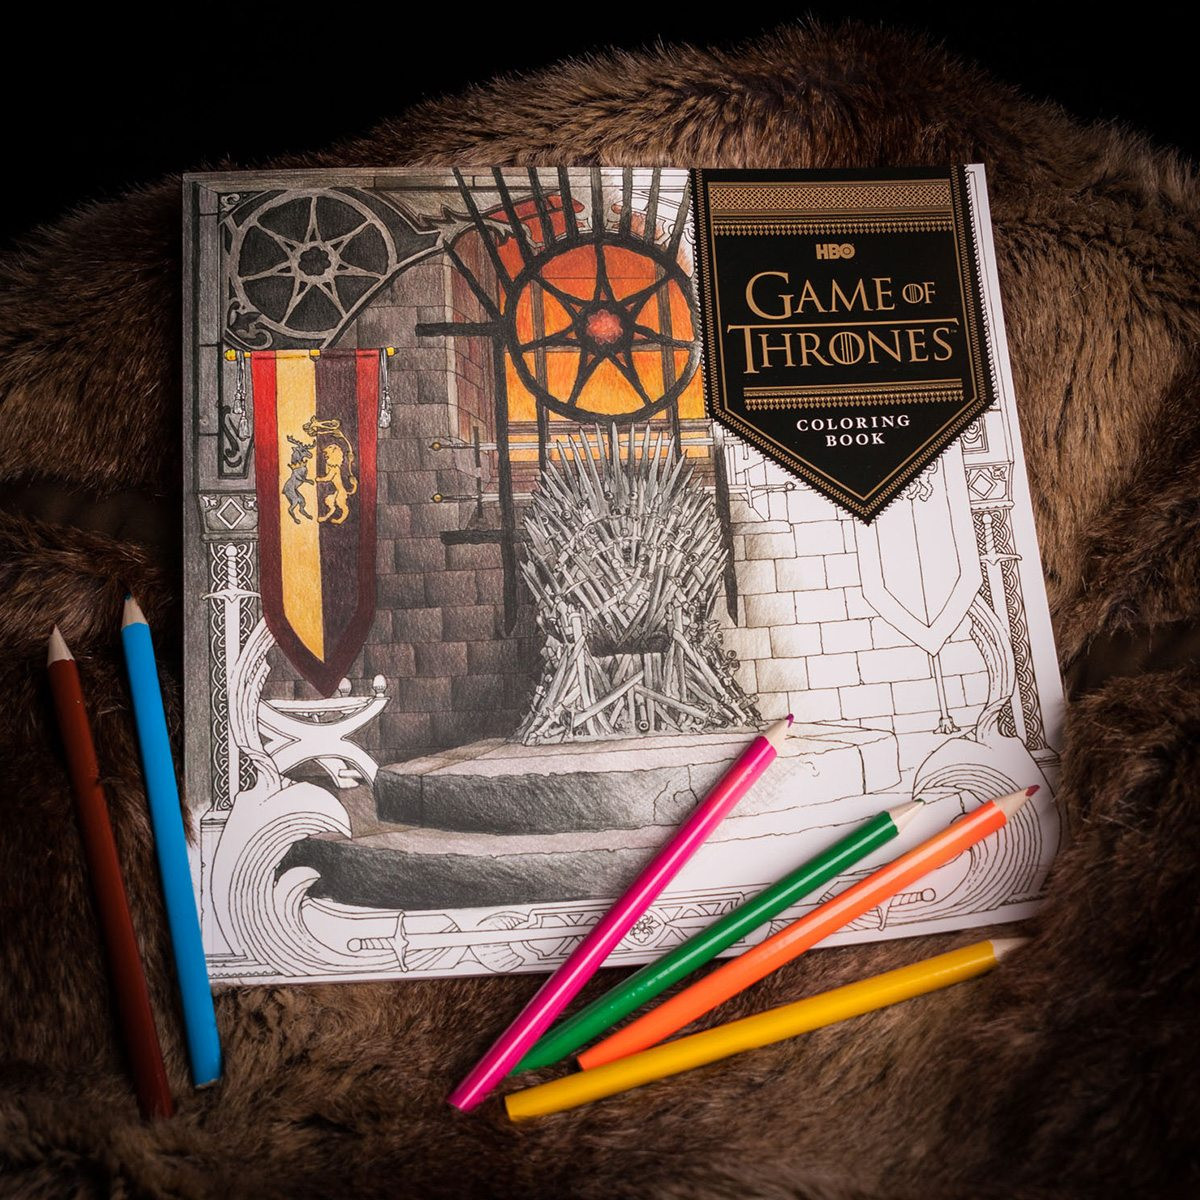 Game Of Thrones Geschenkideen  Game Thrones Malbuch GeschenkeGeek hier findest du